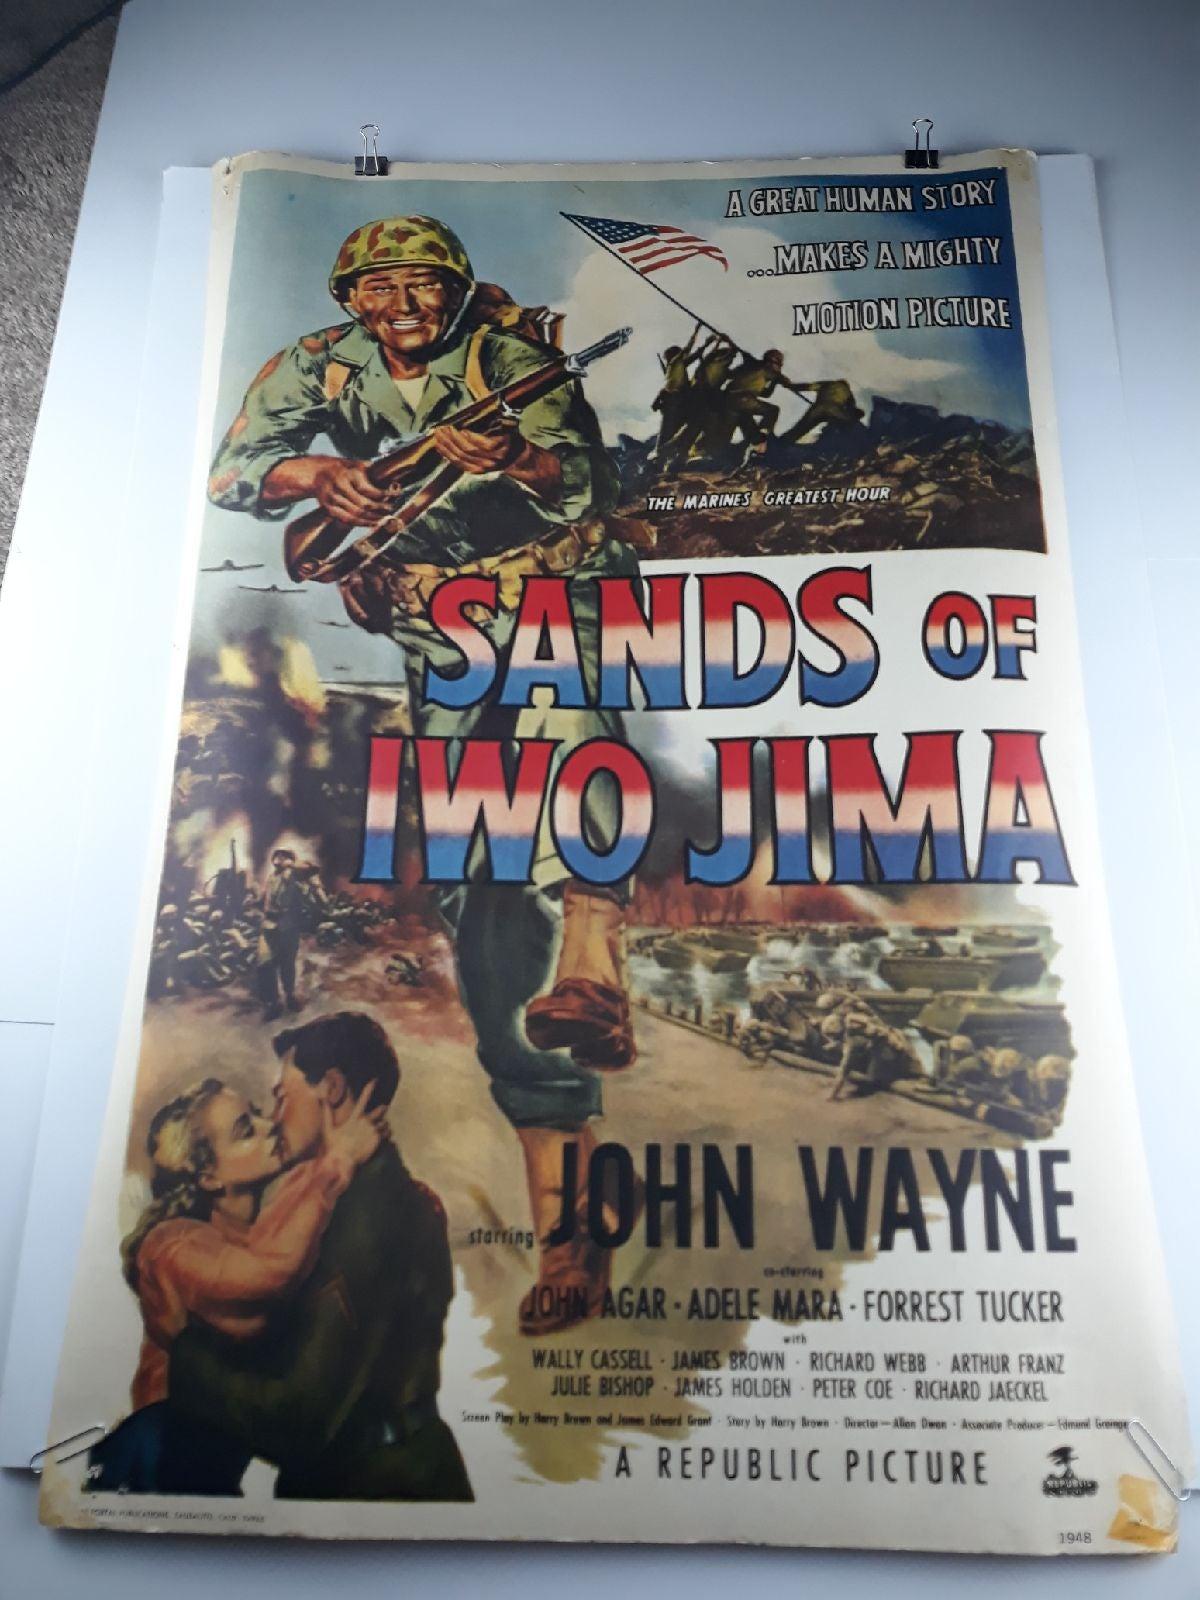 Vintage 1970s Sands of Iwo Jima reprint